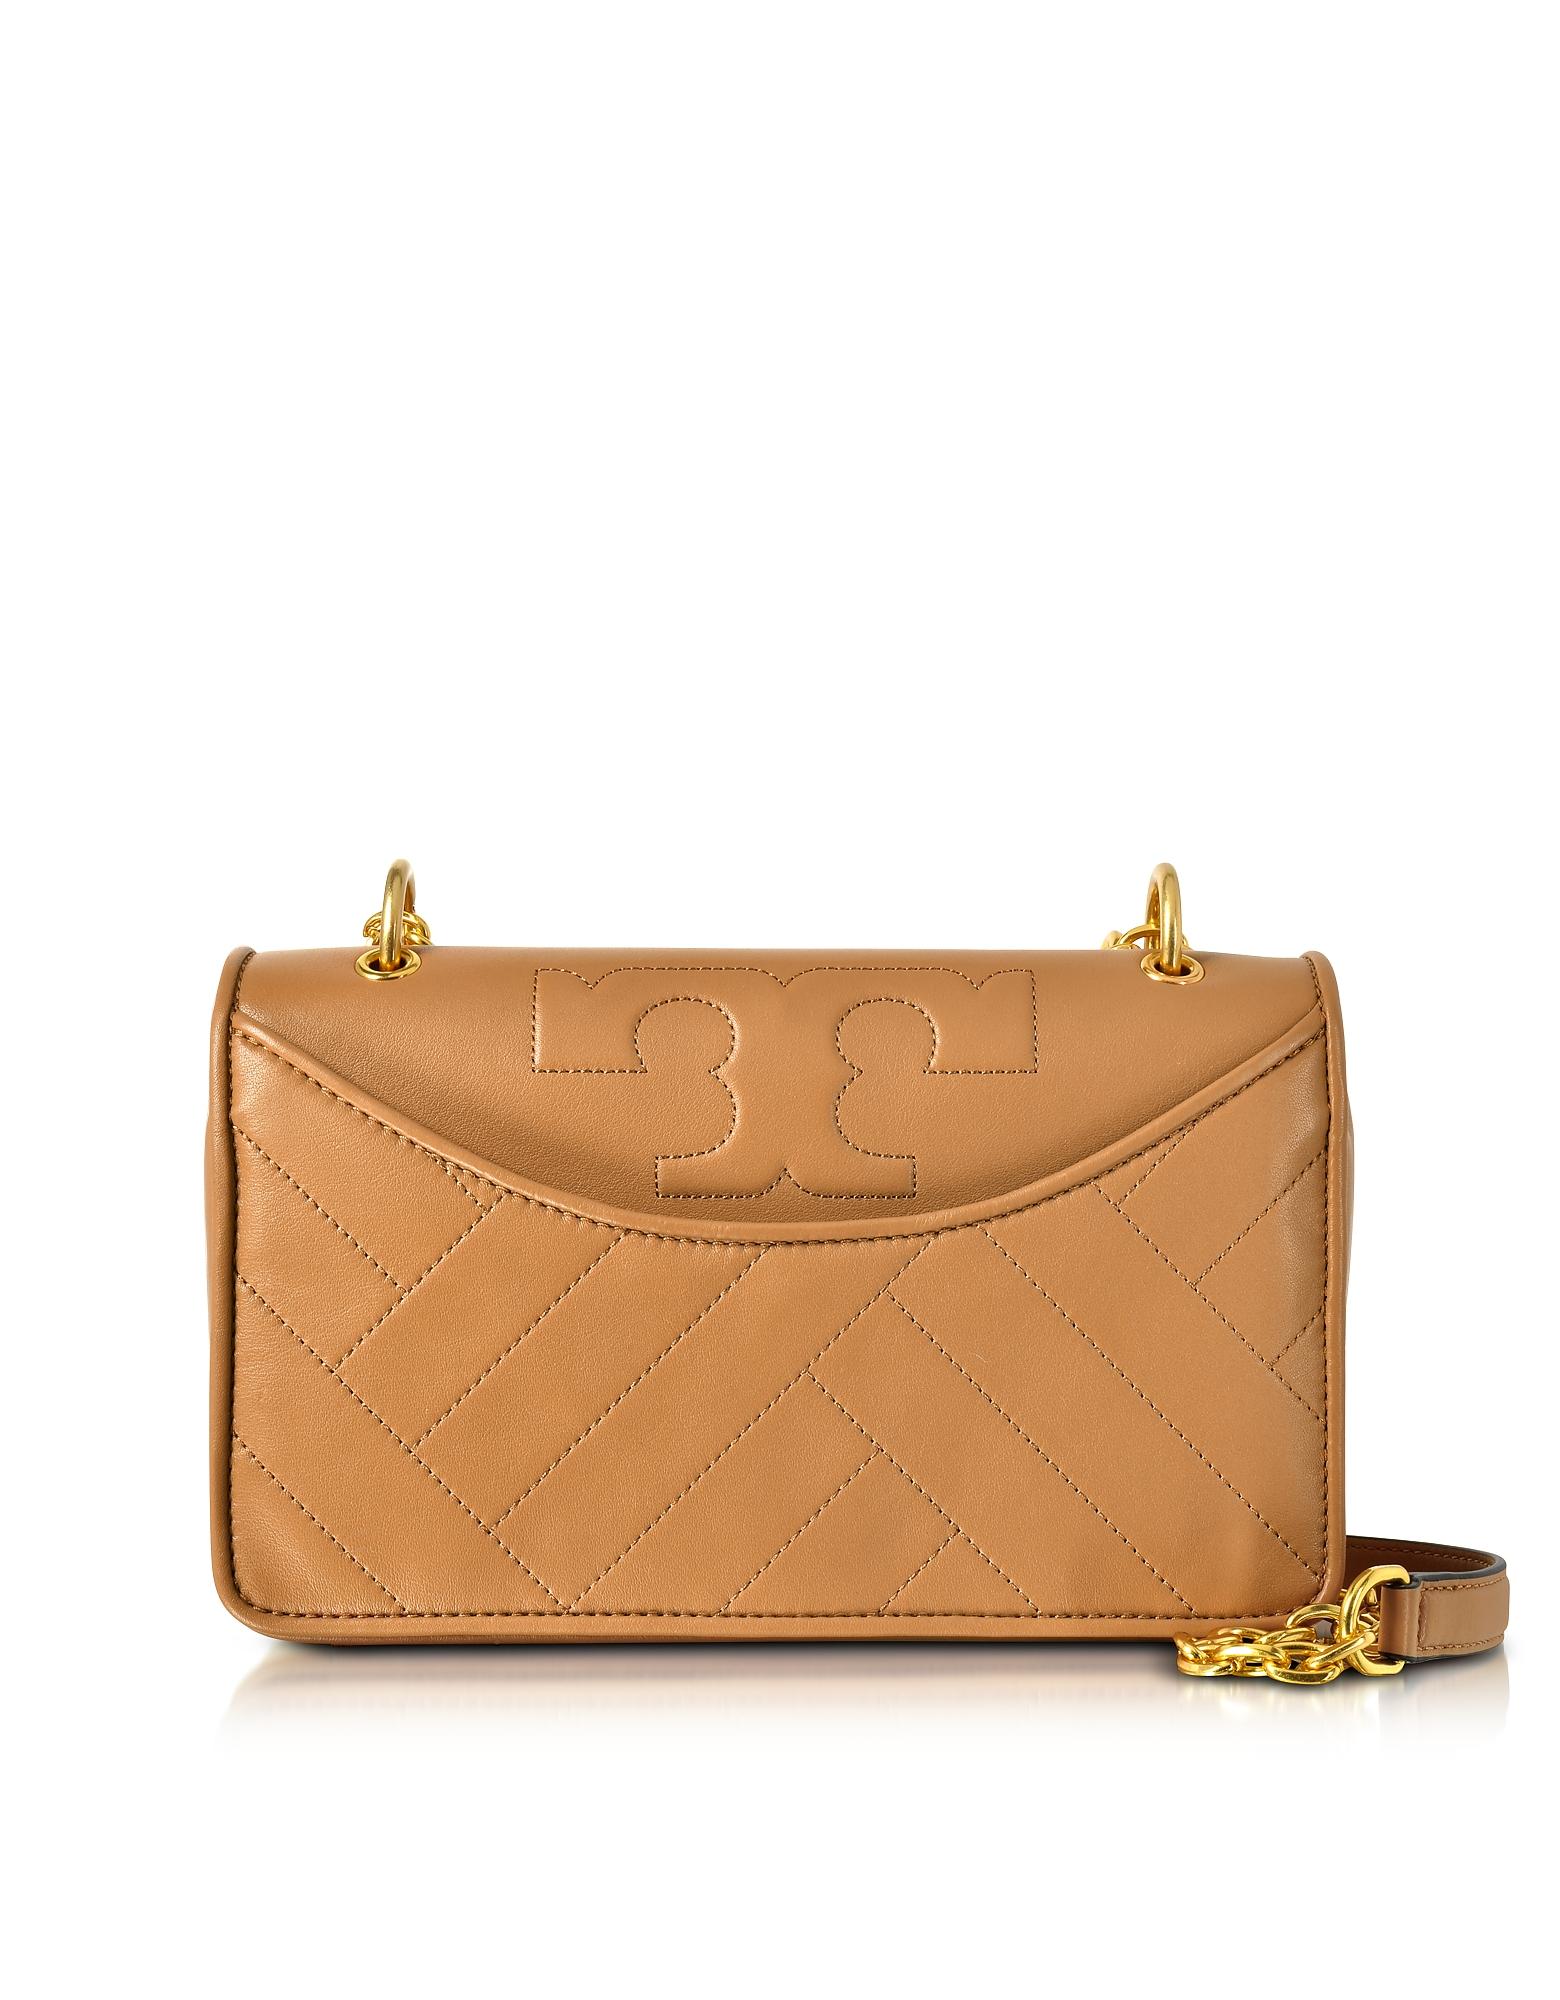 Tory Burch Handbags, Alexa Aged Vachetta Leather Shoulder Bag